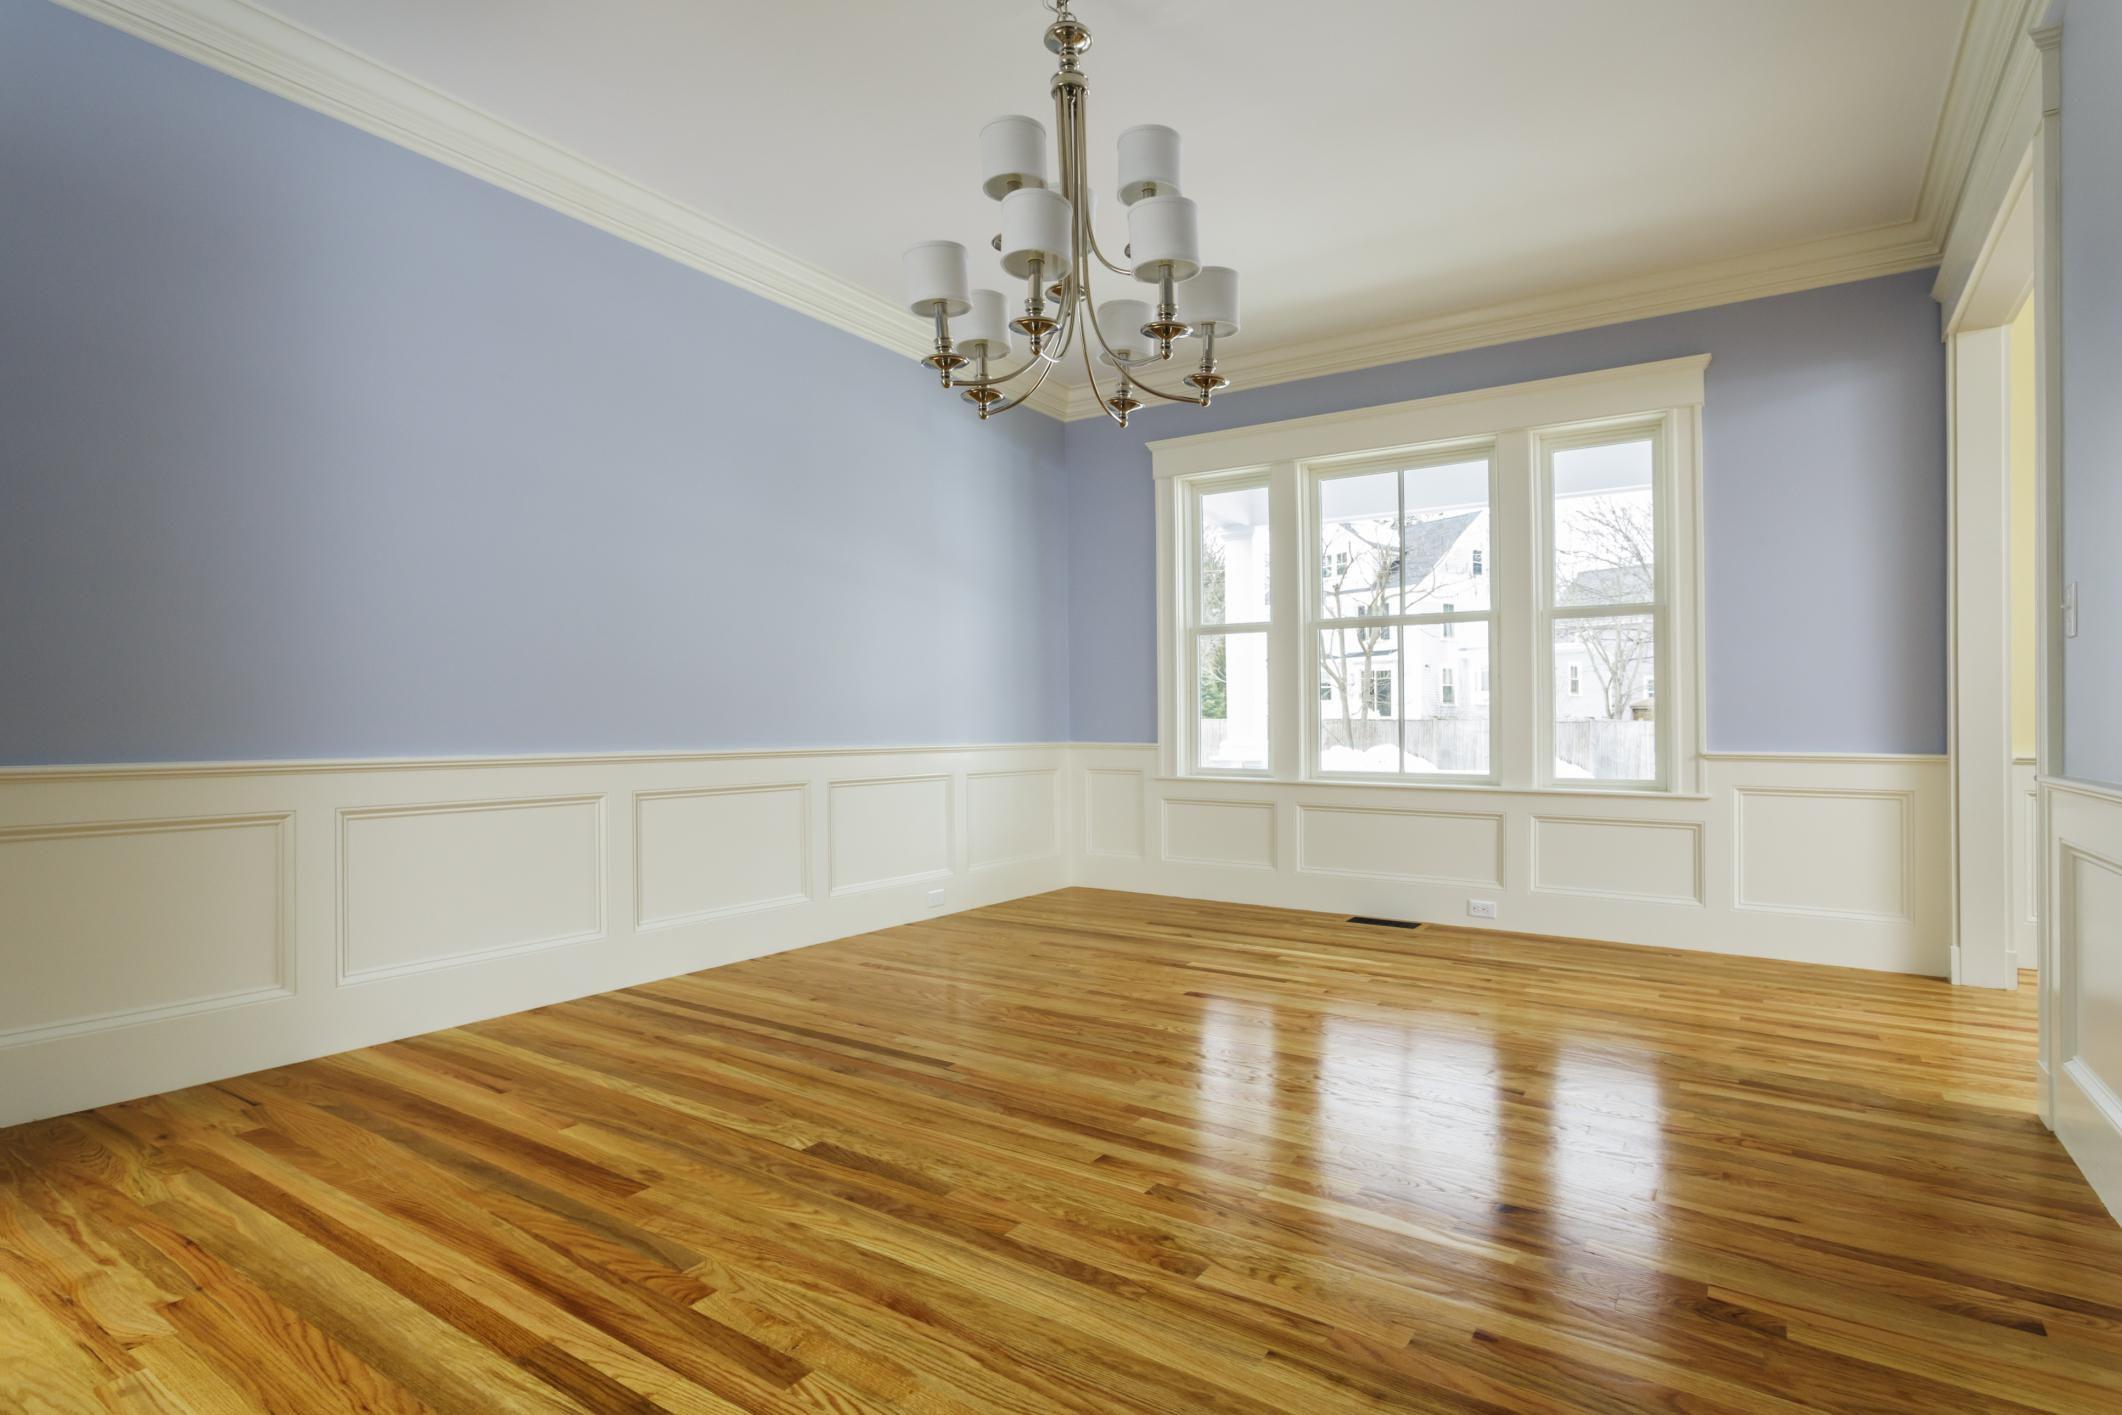 3 oak hardwood flooring of engineered laminate solid hardwood wood flooring with regard to 168686572 56a49ed73df78cf772834d31